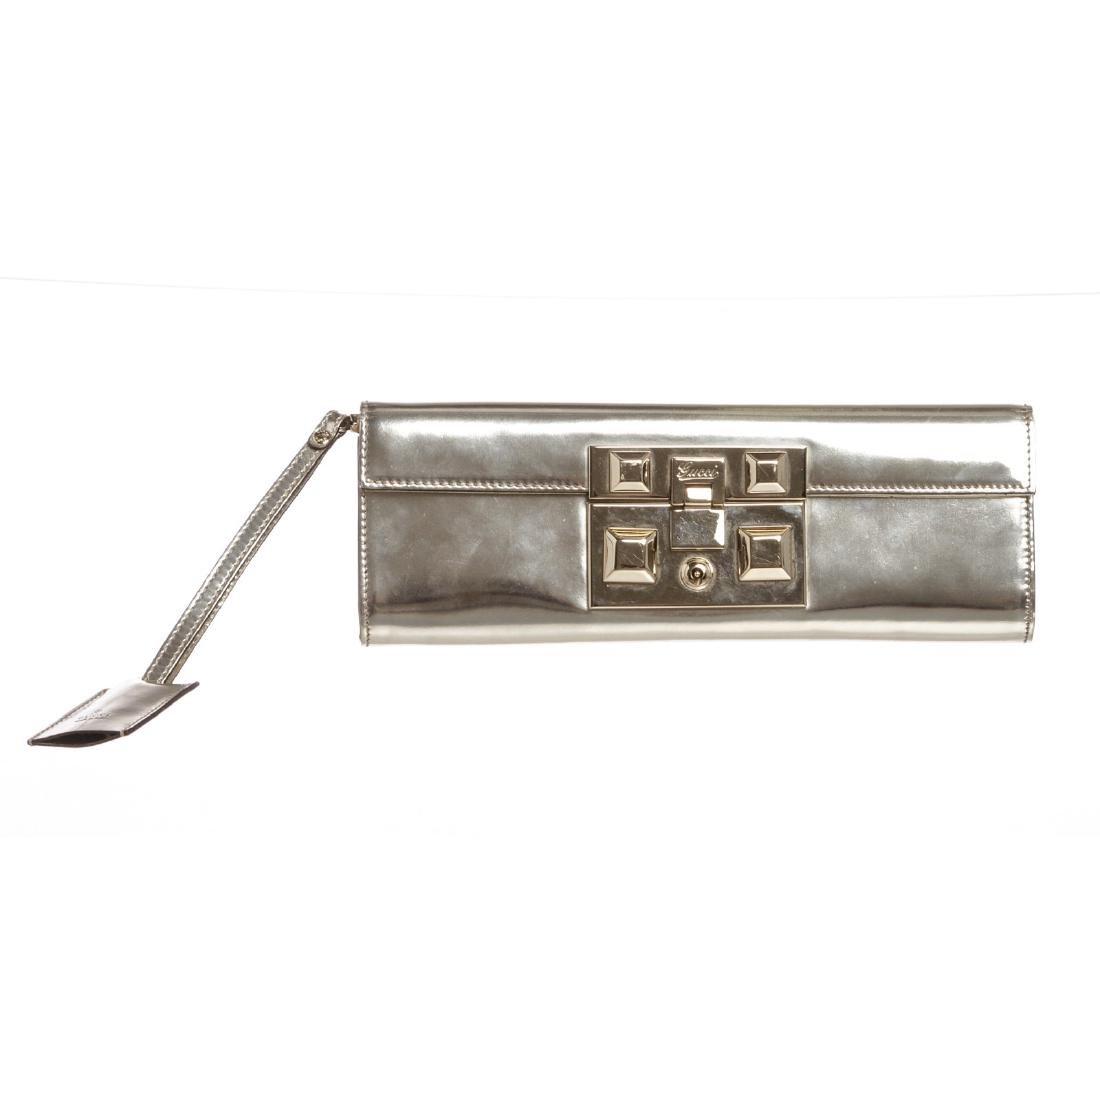 Gucci Metallic Silver Leather Evening Clutch Bag